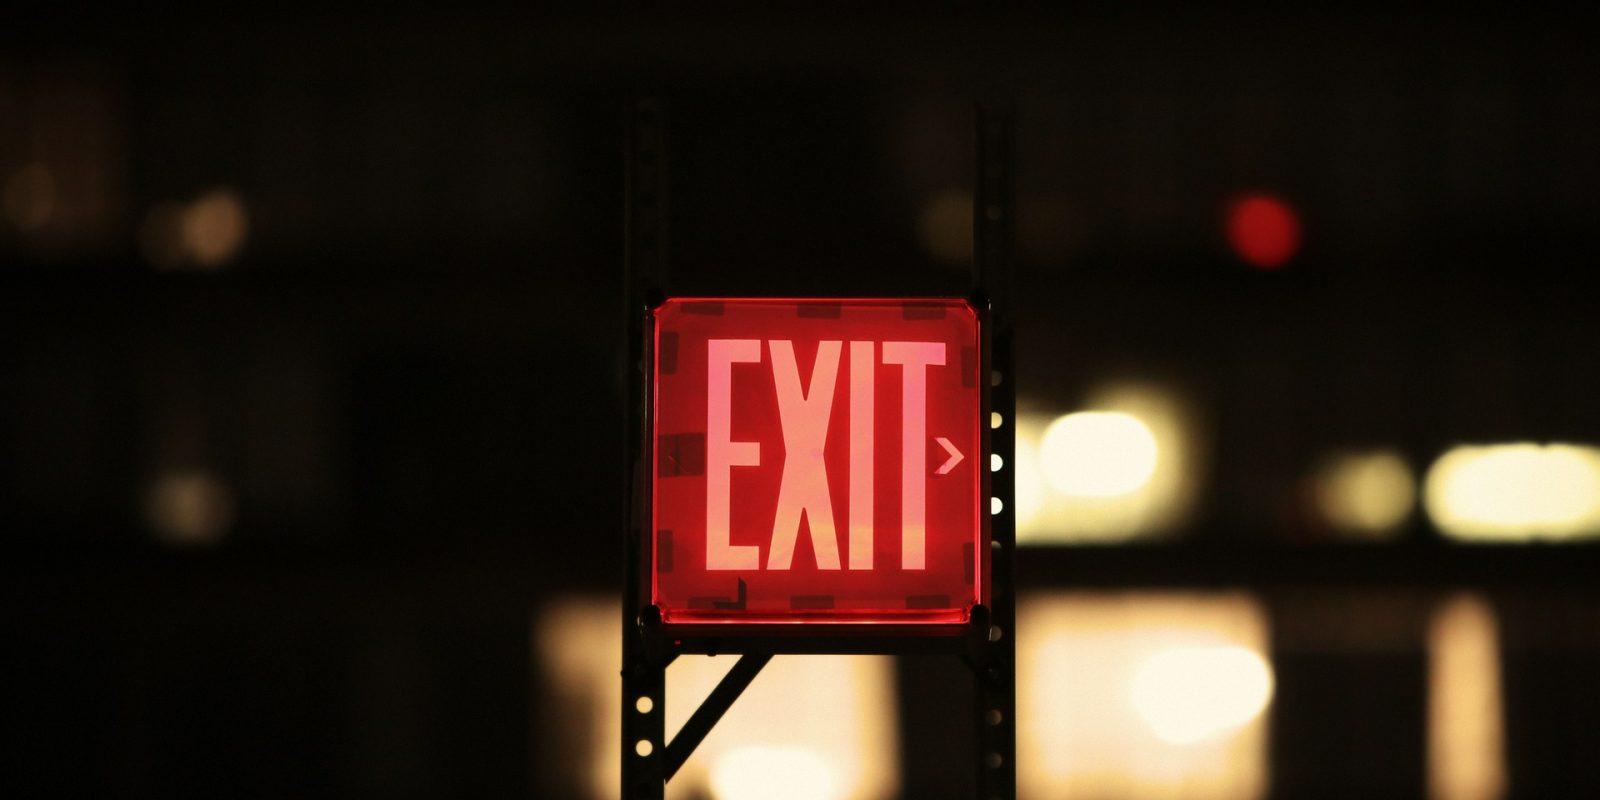 exit-498428_1920